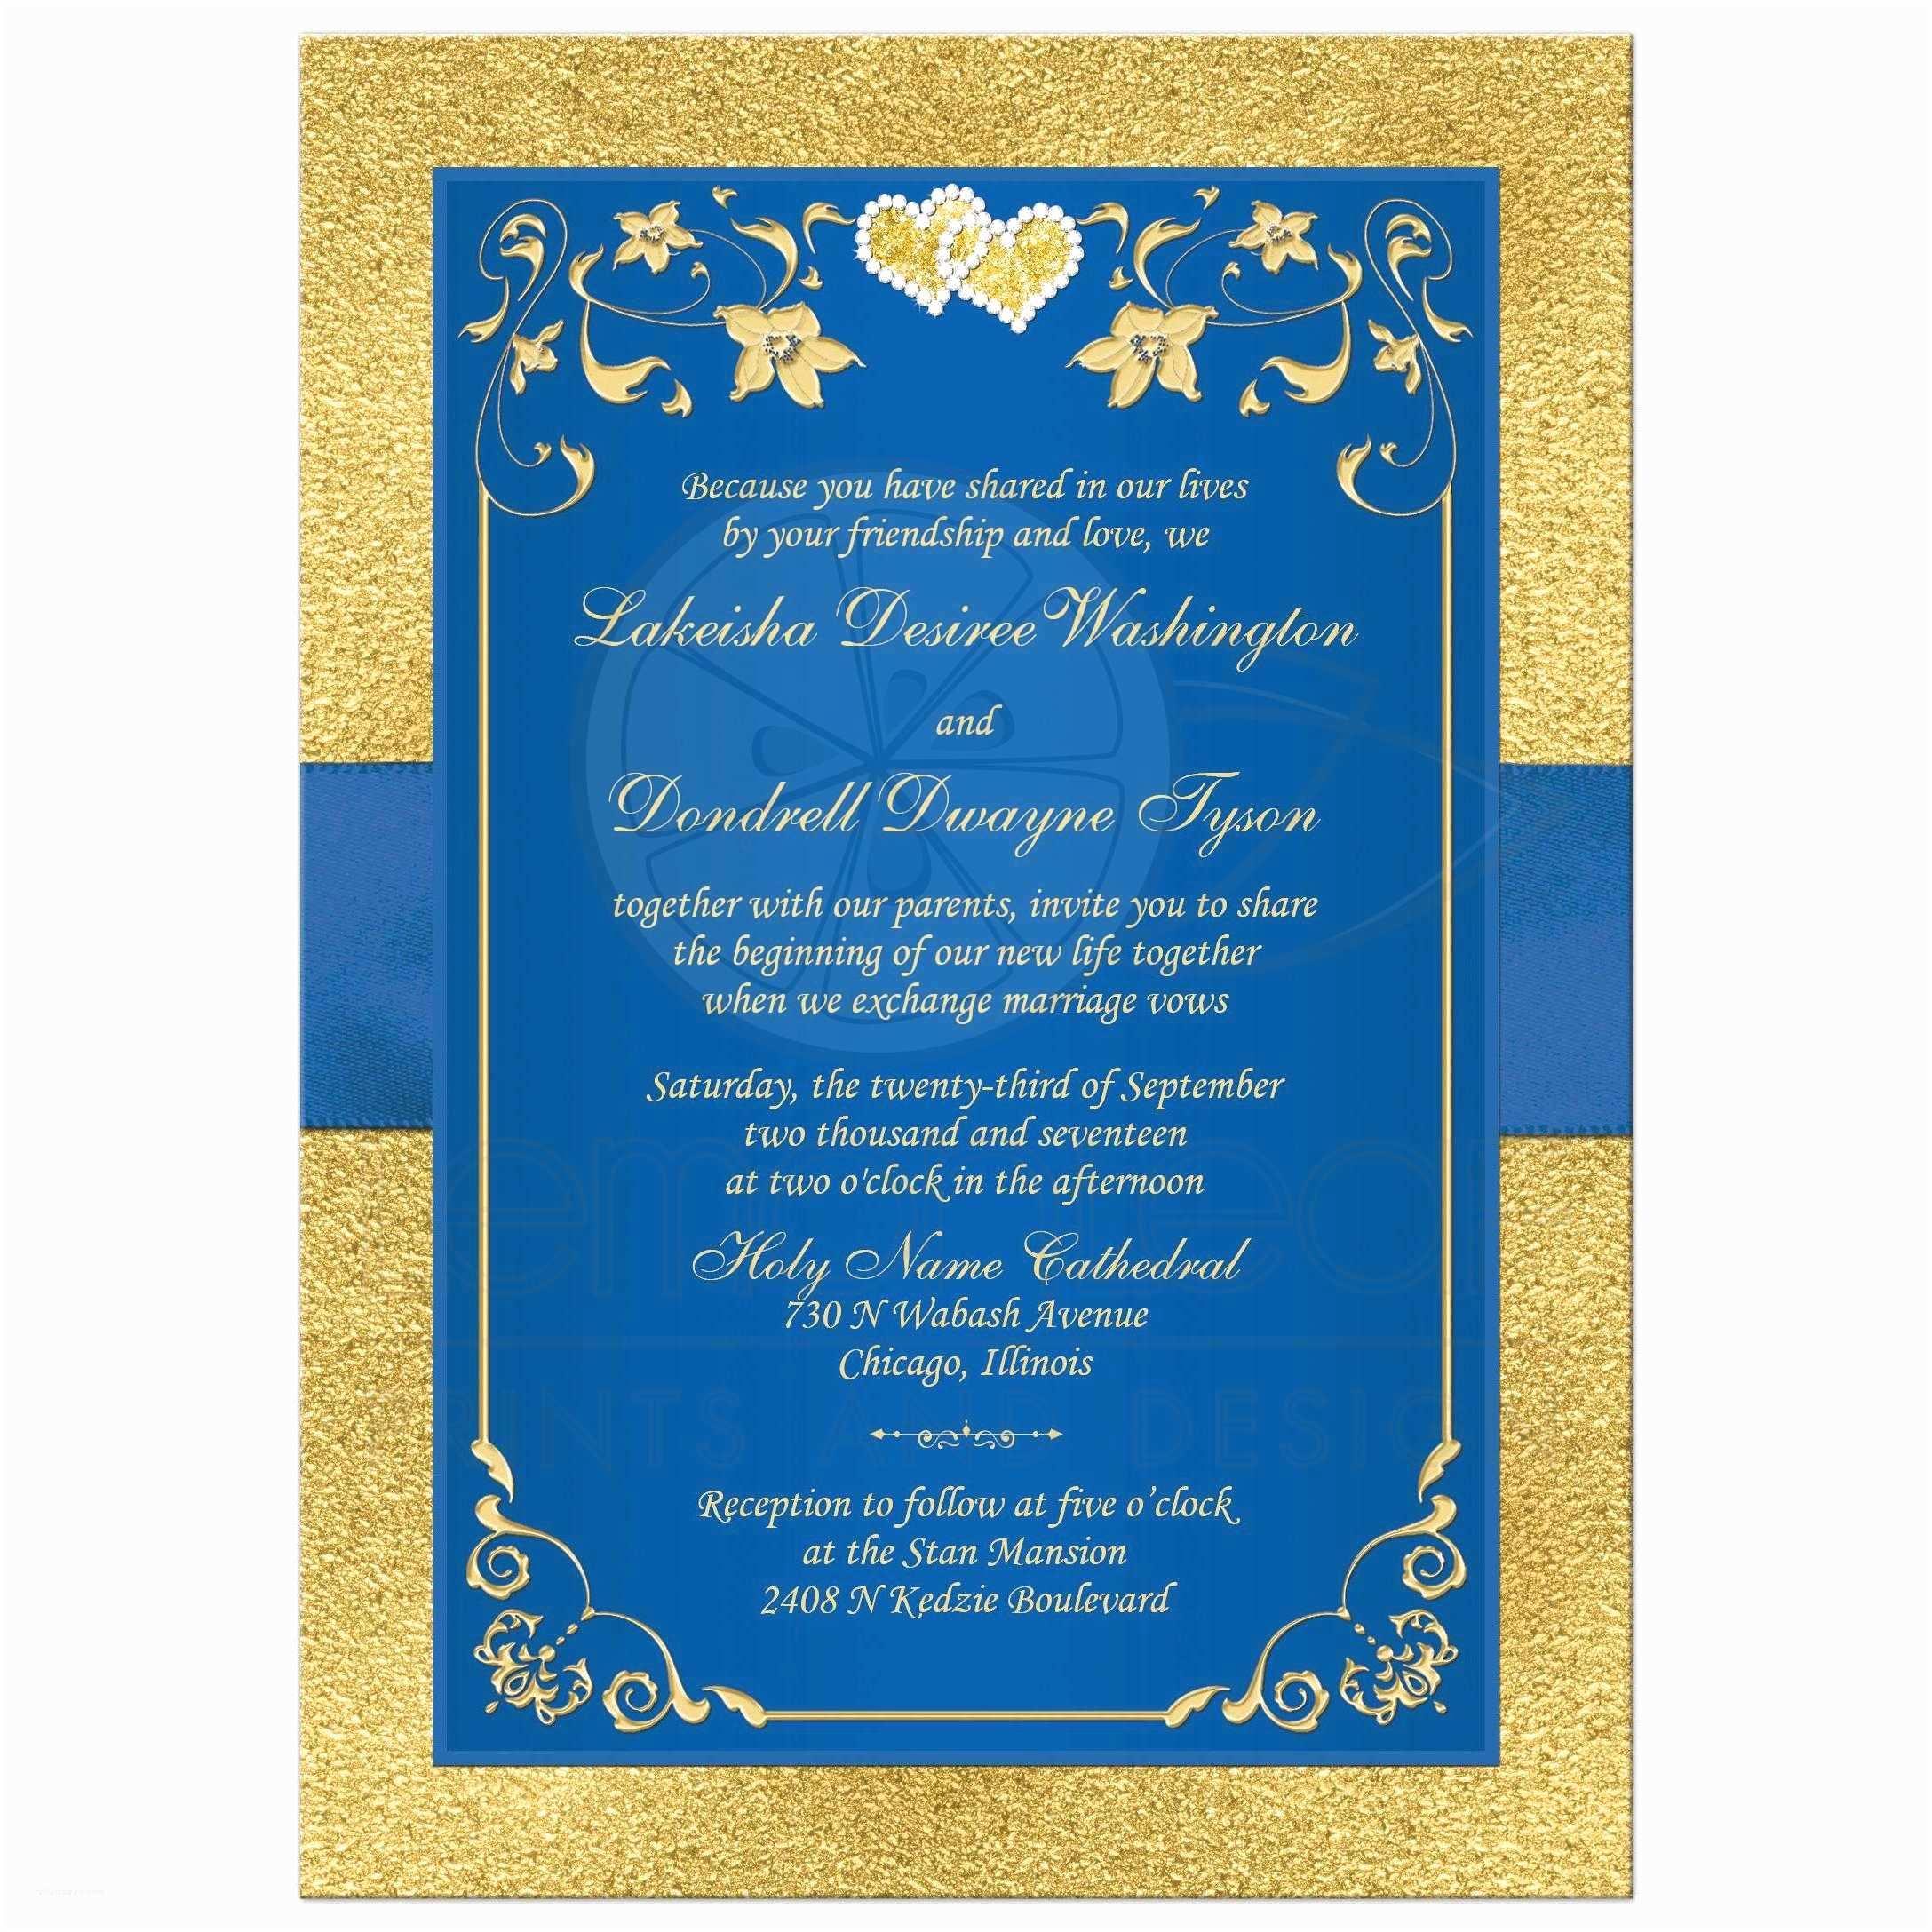 Royal Blue and Gold Wedding Invitations Wedding Invitation Royal Blue Faux Gold Foil Floral